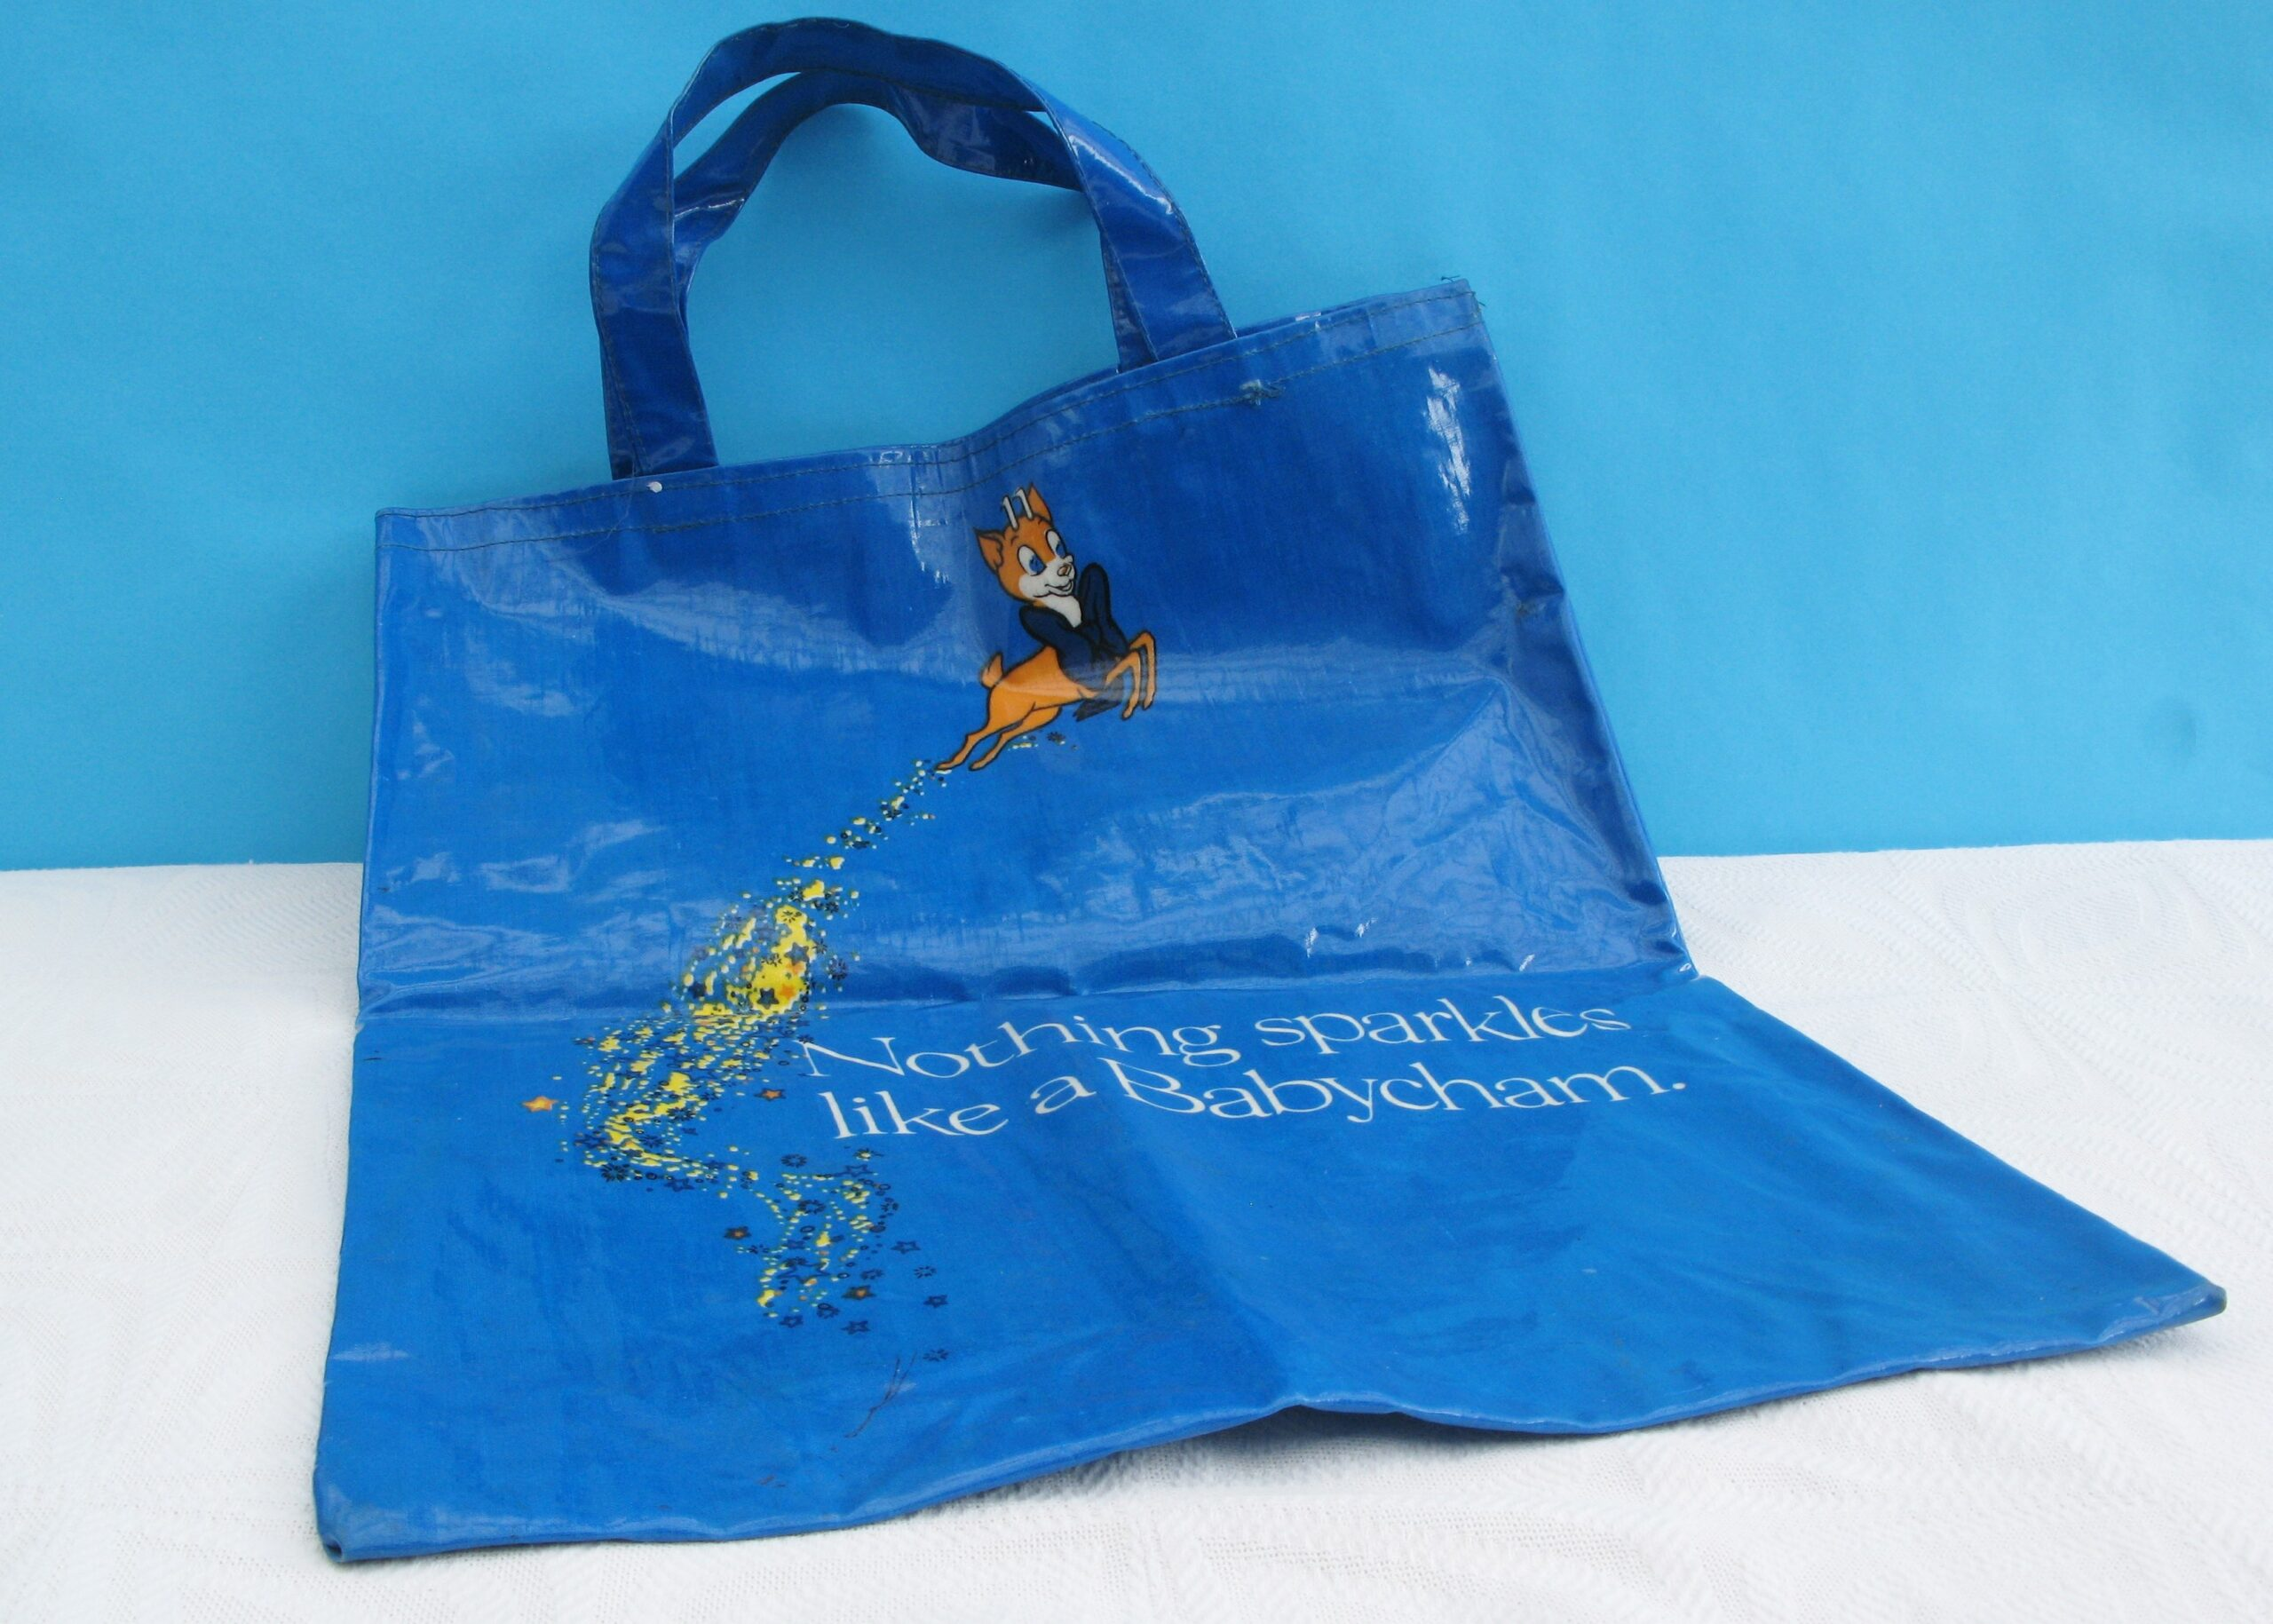 Vintage Babycham Collectable PVC Shopper Shopping Bag 70s 80s